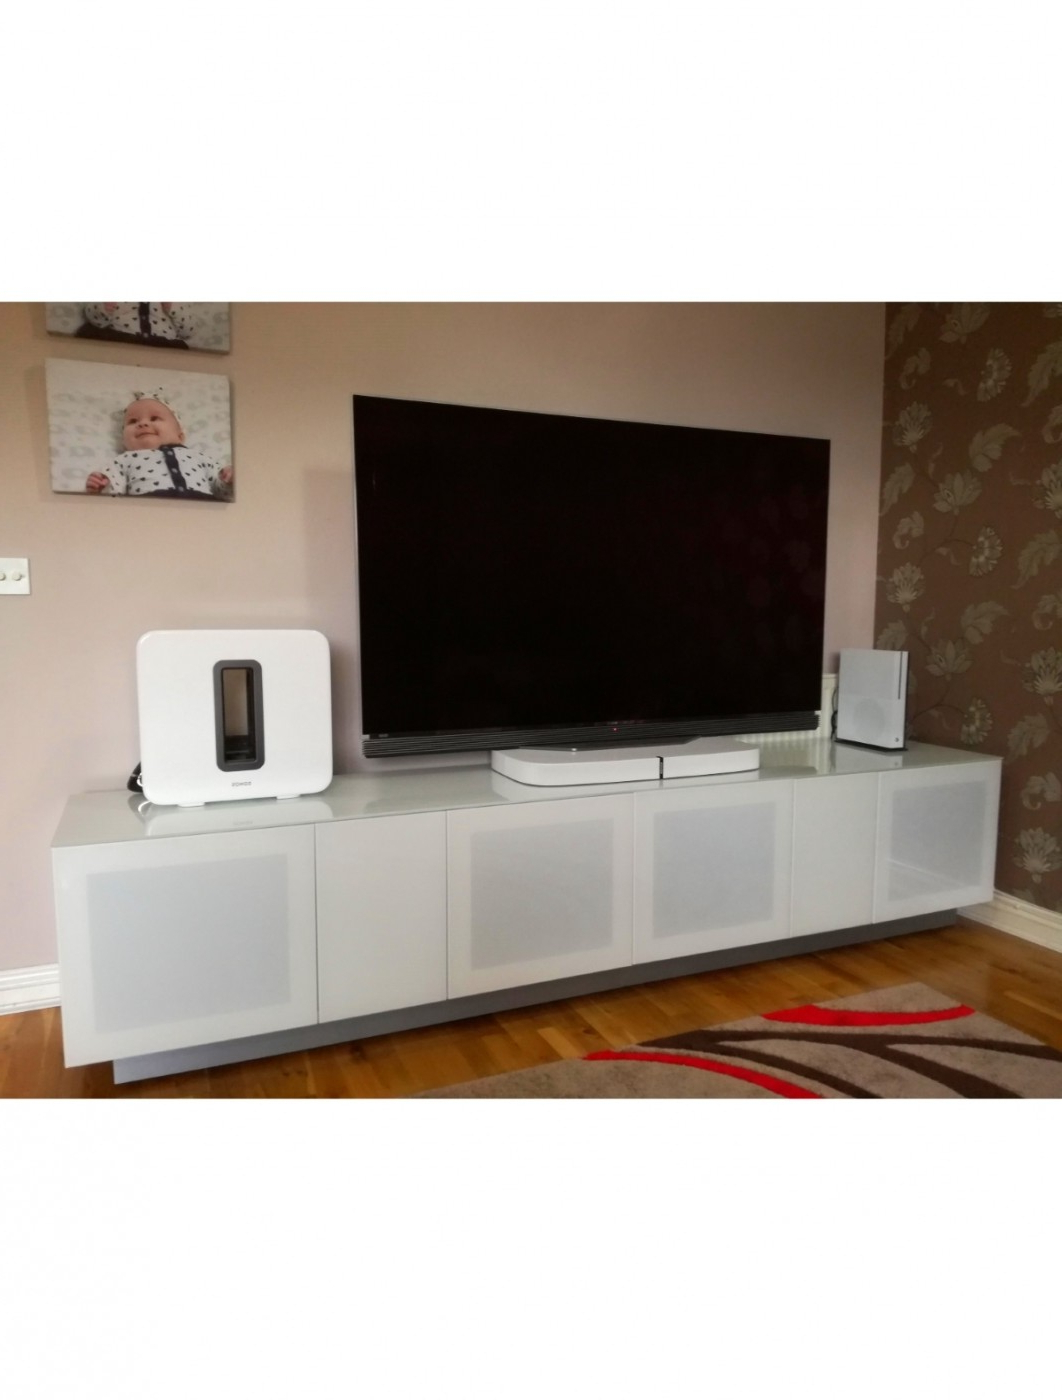 Tv Stand White Element 2500xl Modular Tv Cabinet Emt2500xl Inside 57'' Tv Stands With Open Glass Shelves Gray & Black Finsh (View 10 of 20)